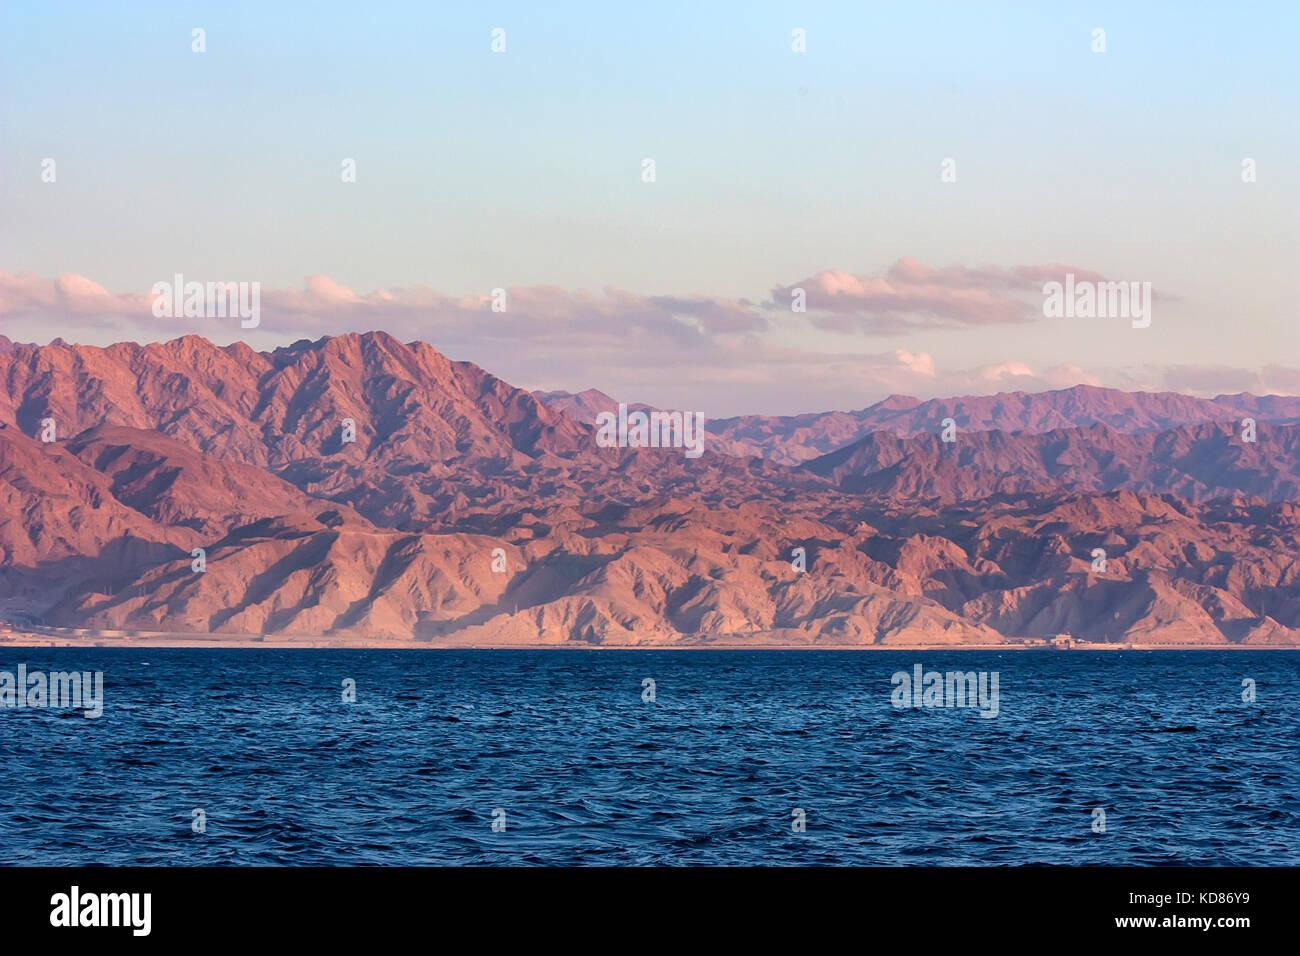 Red Sea rocky coastline in Saudi Arabia - Stock Image